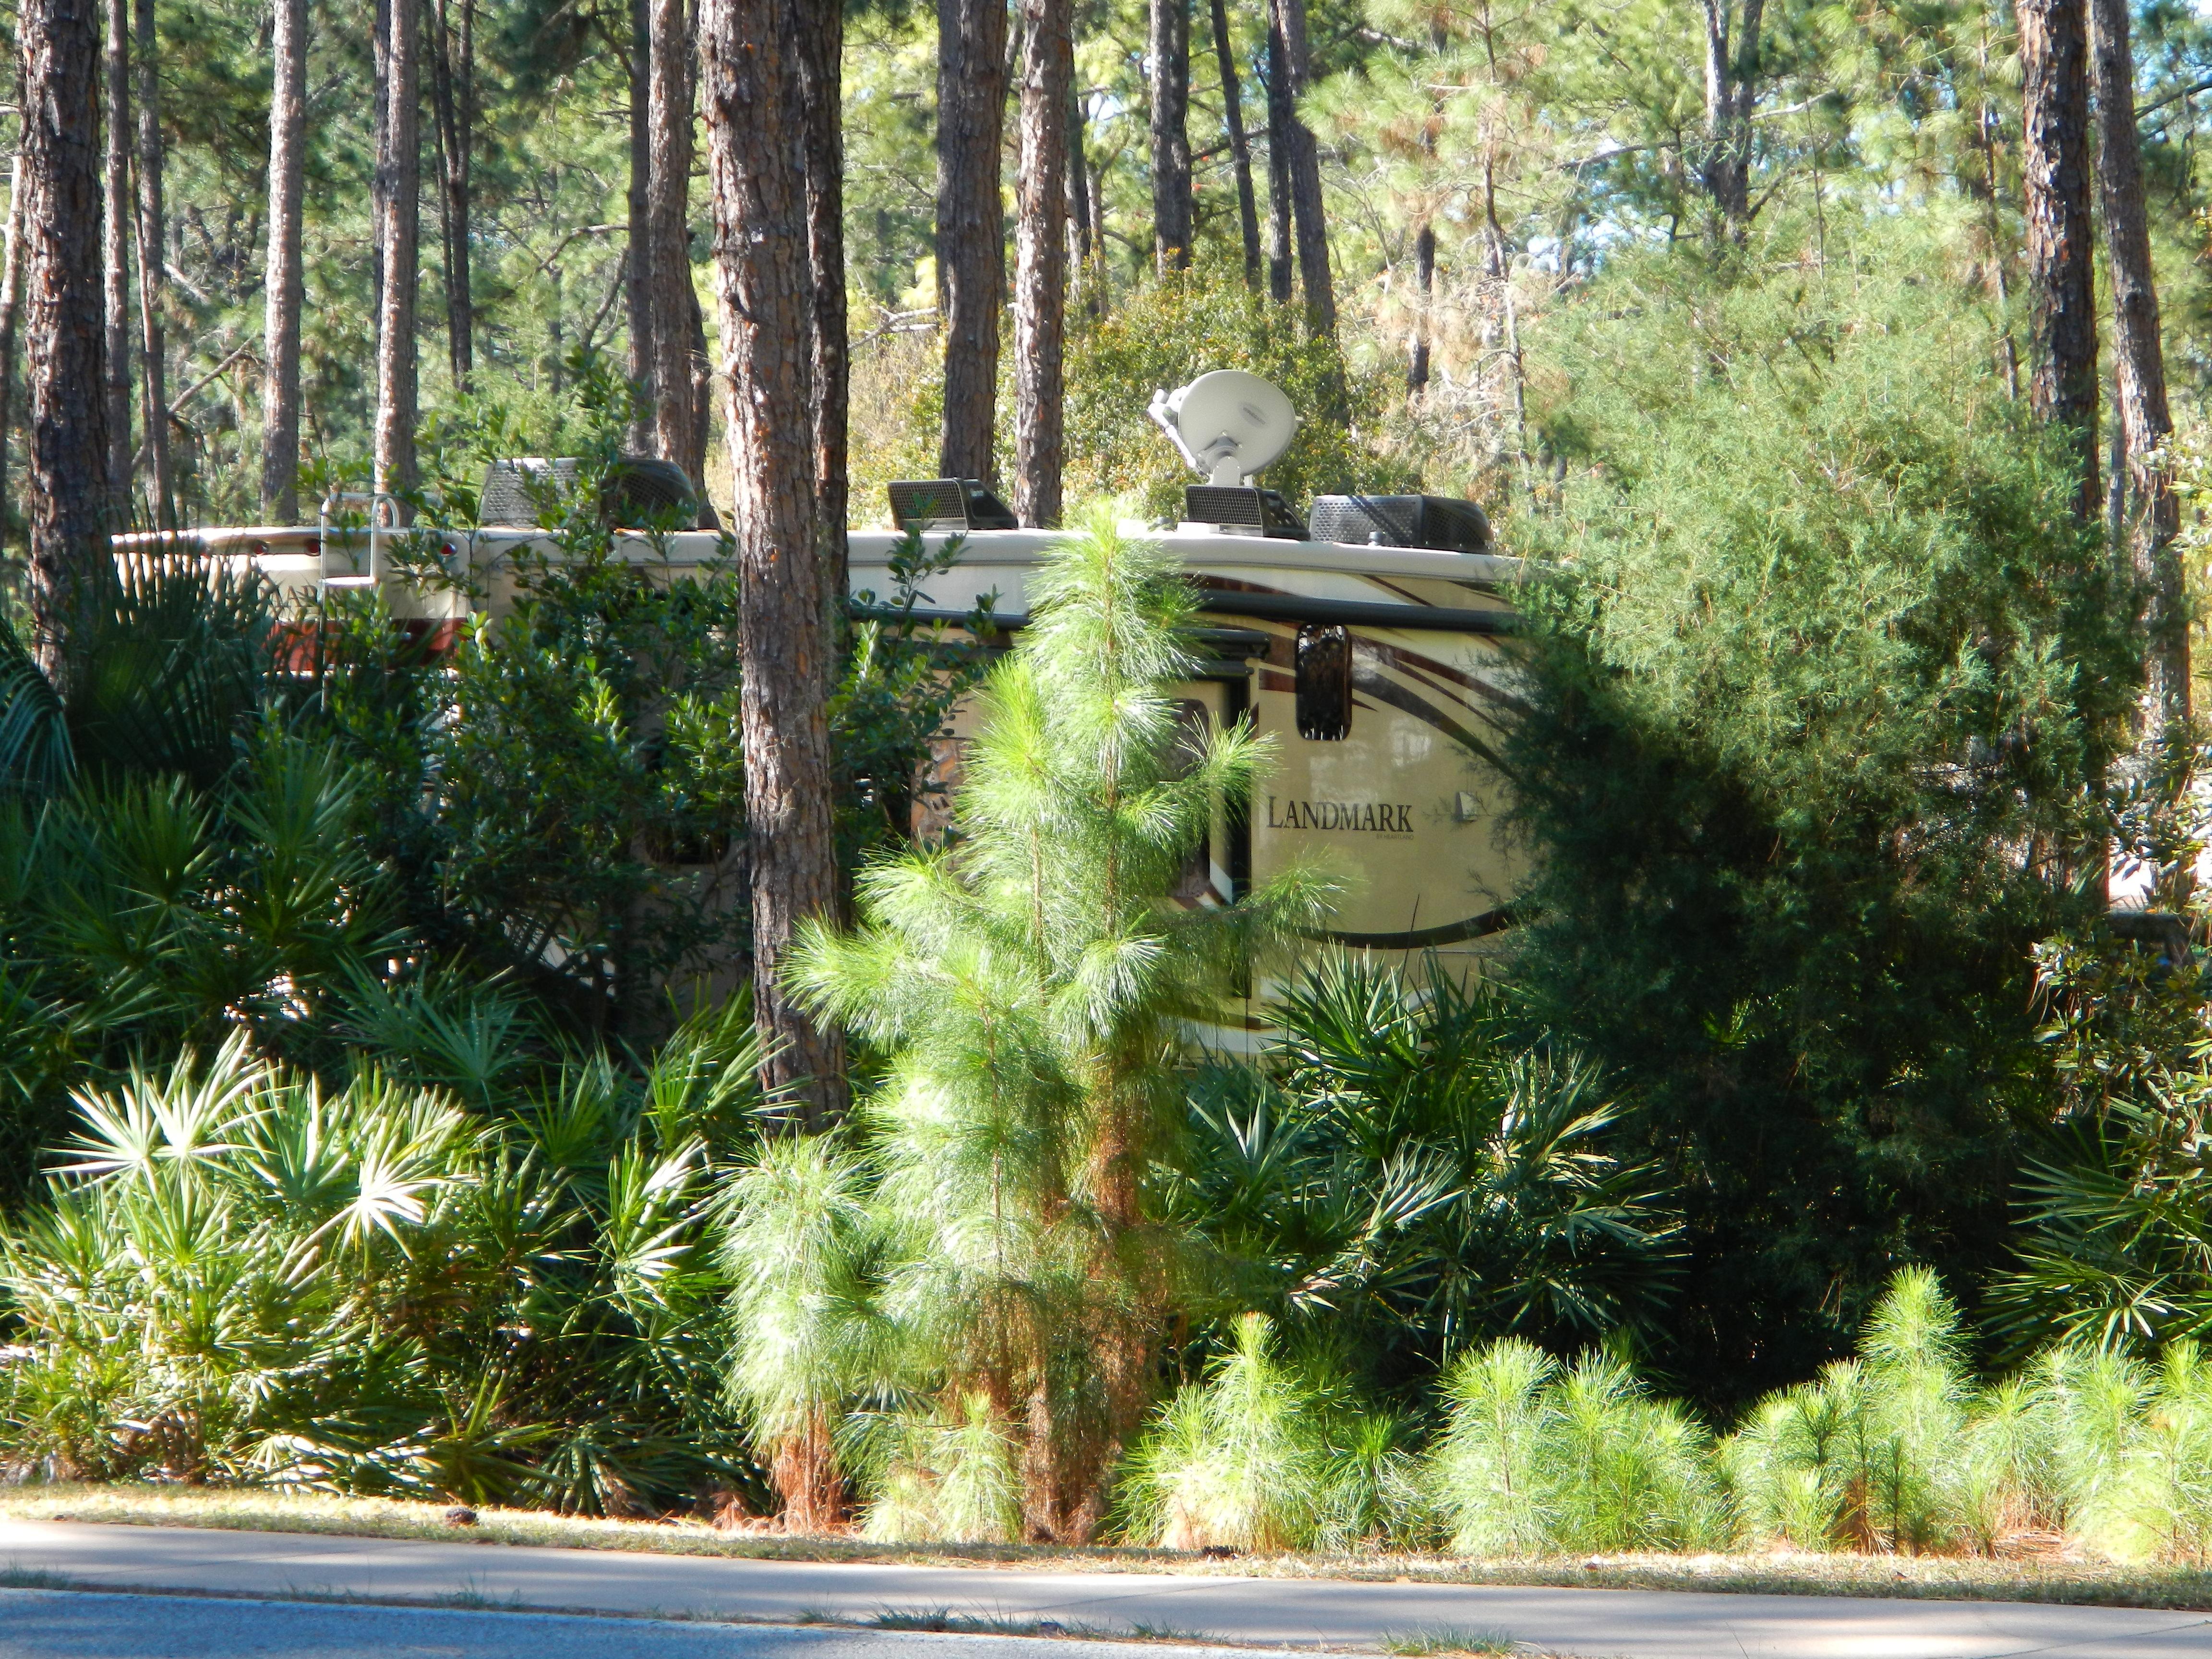 Misc - 2014 Heartland Landmark Savannah at Fort Wilderness Site 1217